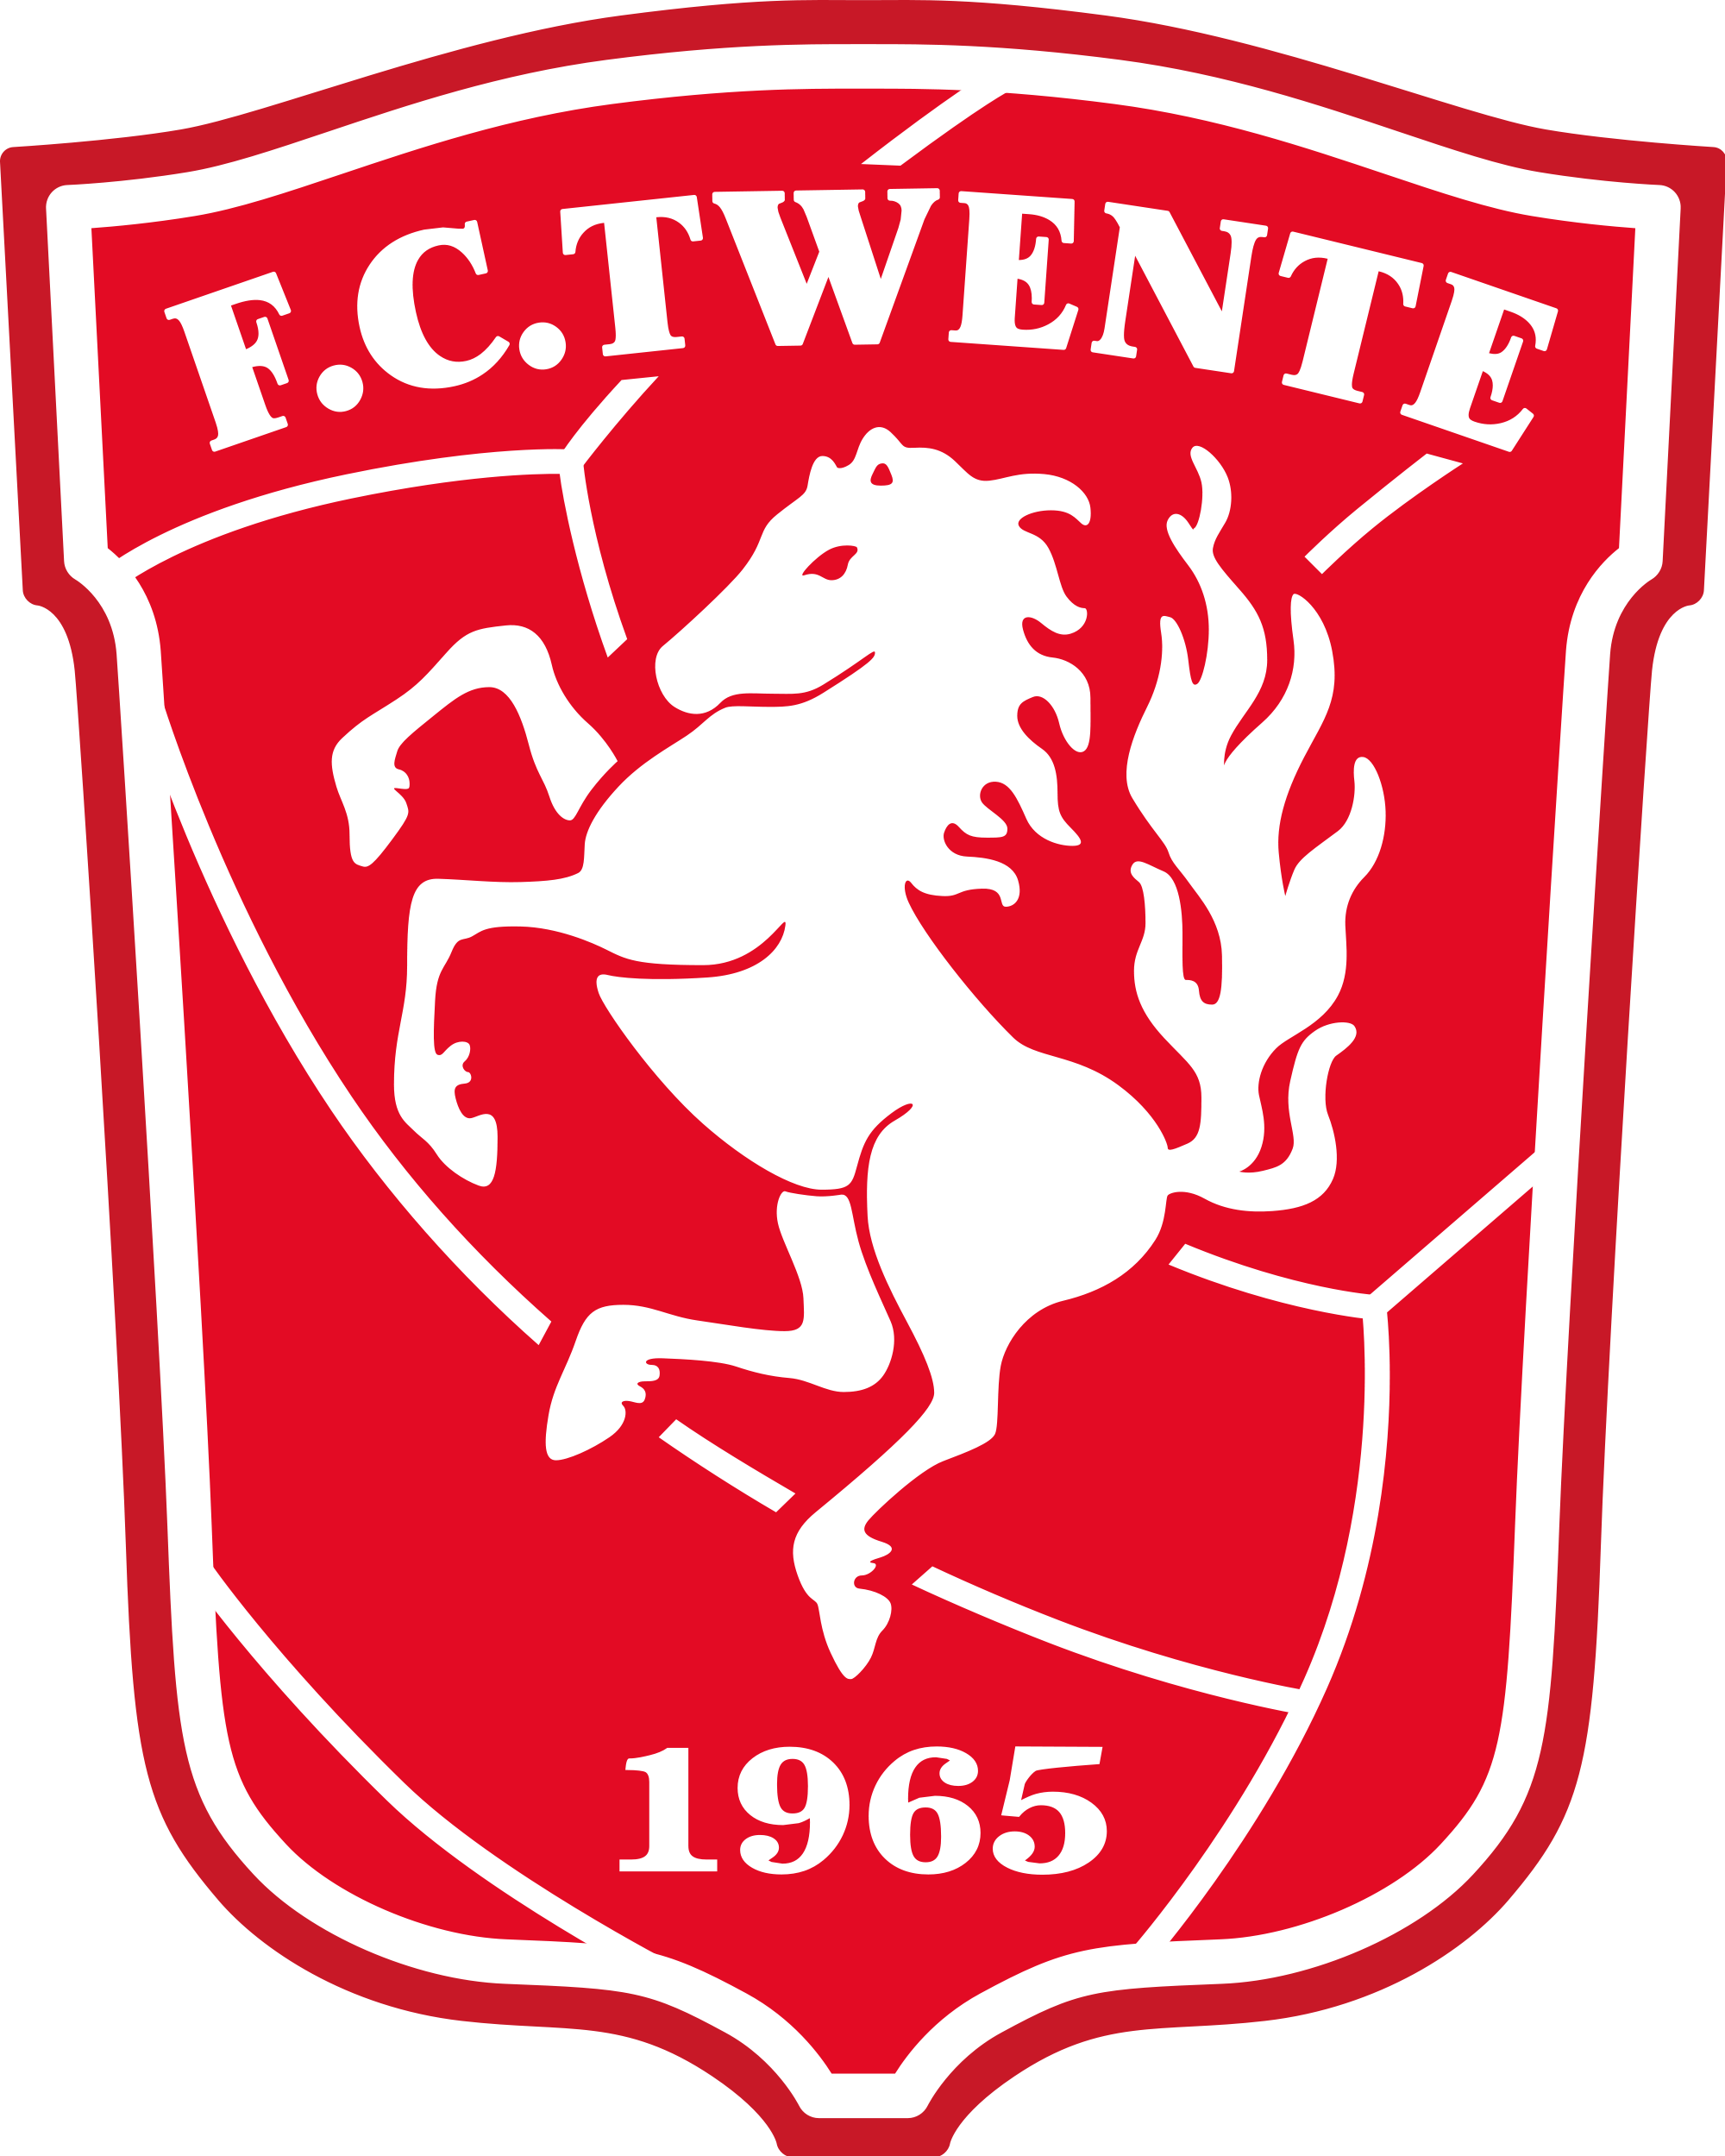 FC Twente Logo Wallpaper